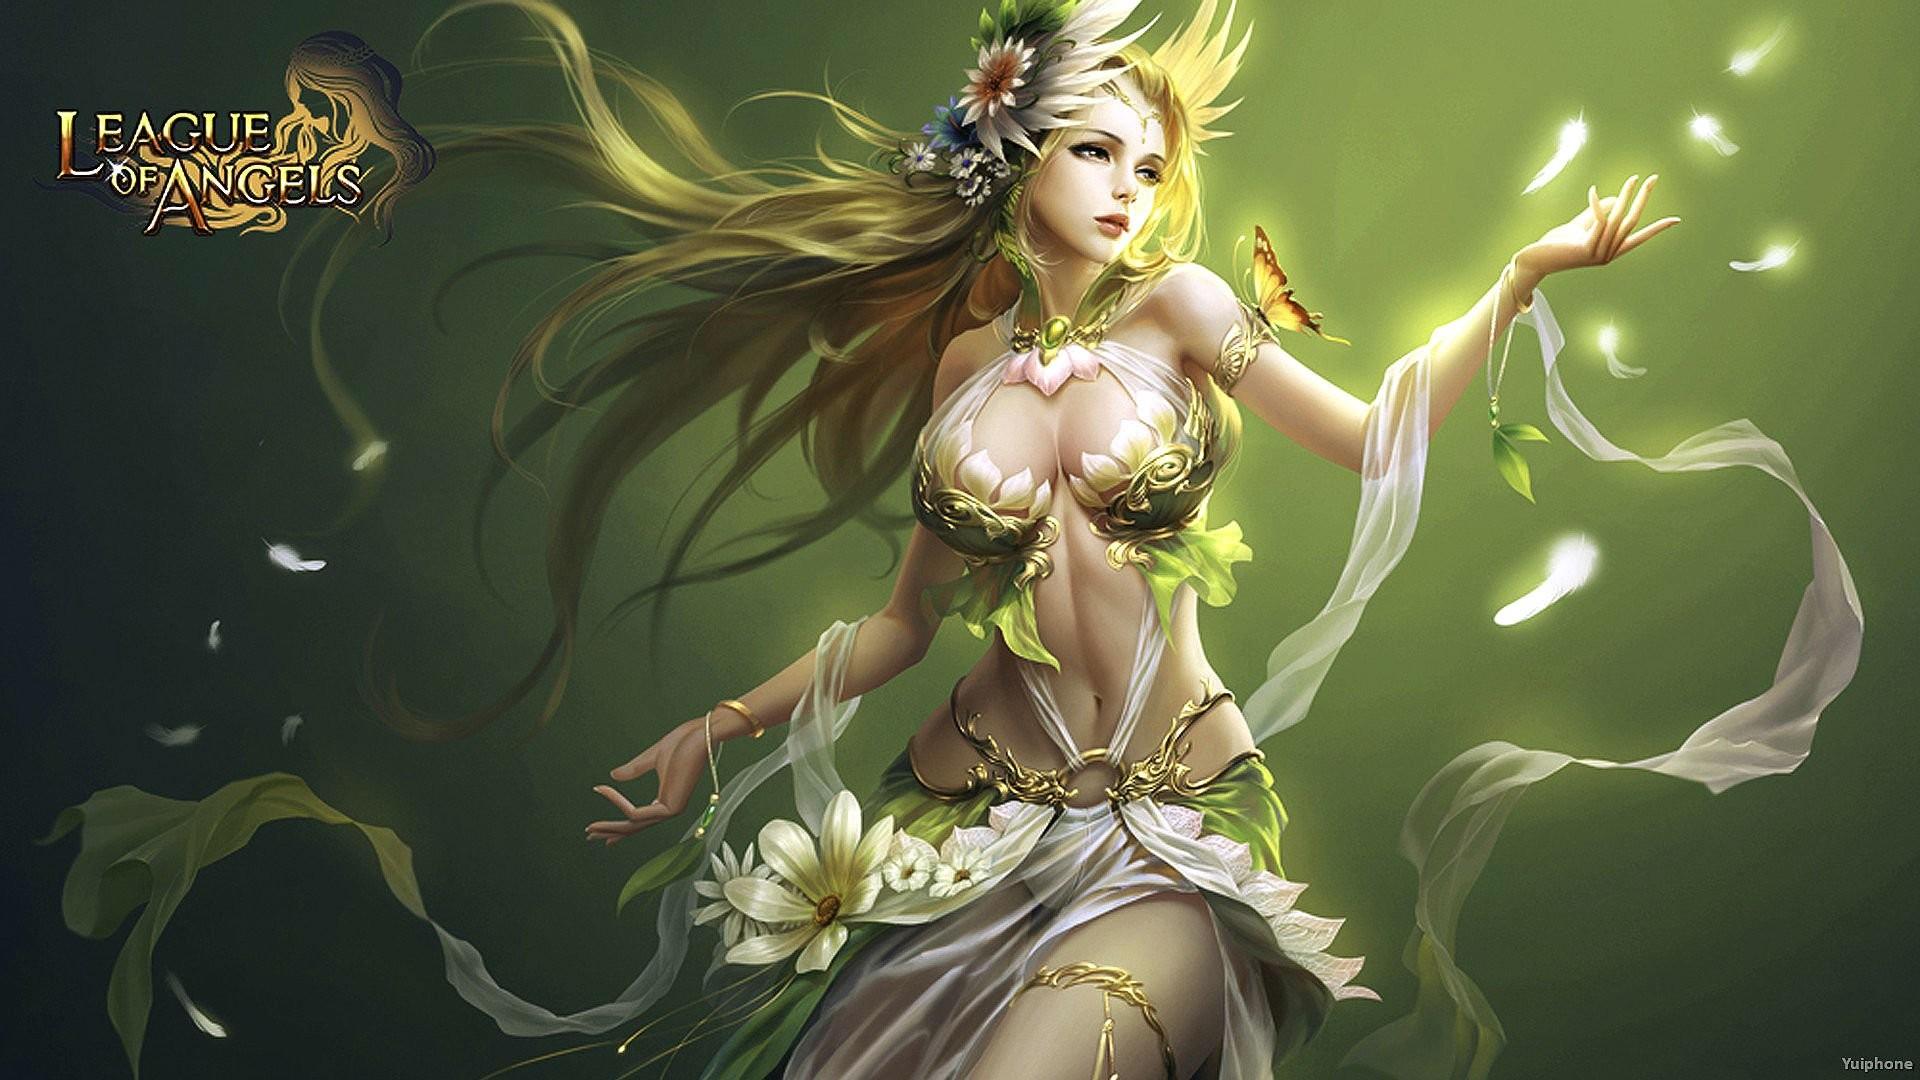 LEAGUE-OF-ANGELS fantasy angel warrior league angels game loa (8) wallpaper      346740   WallpaperUP